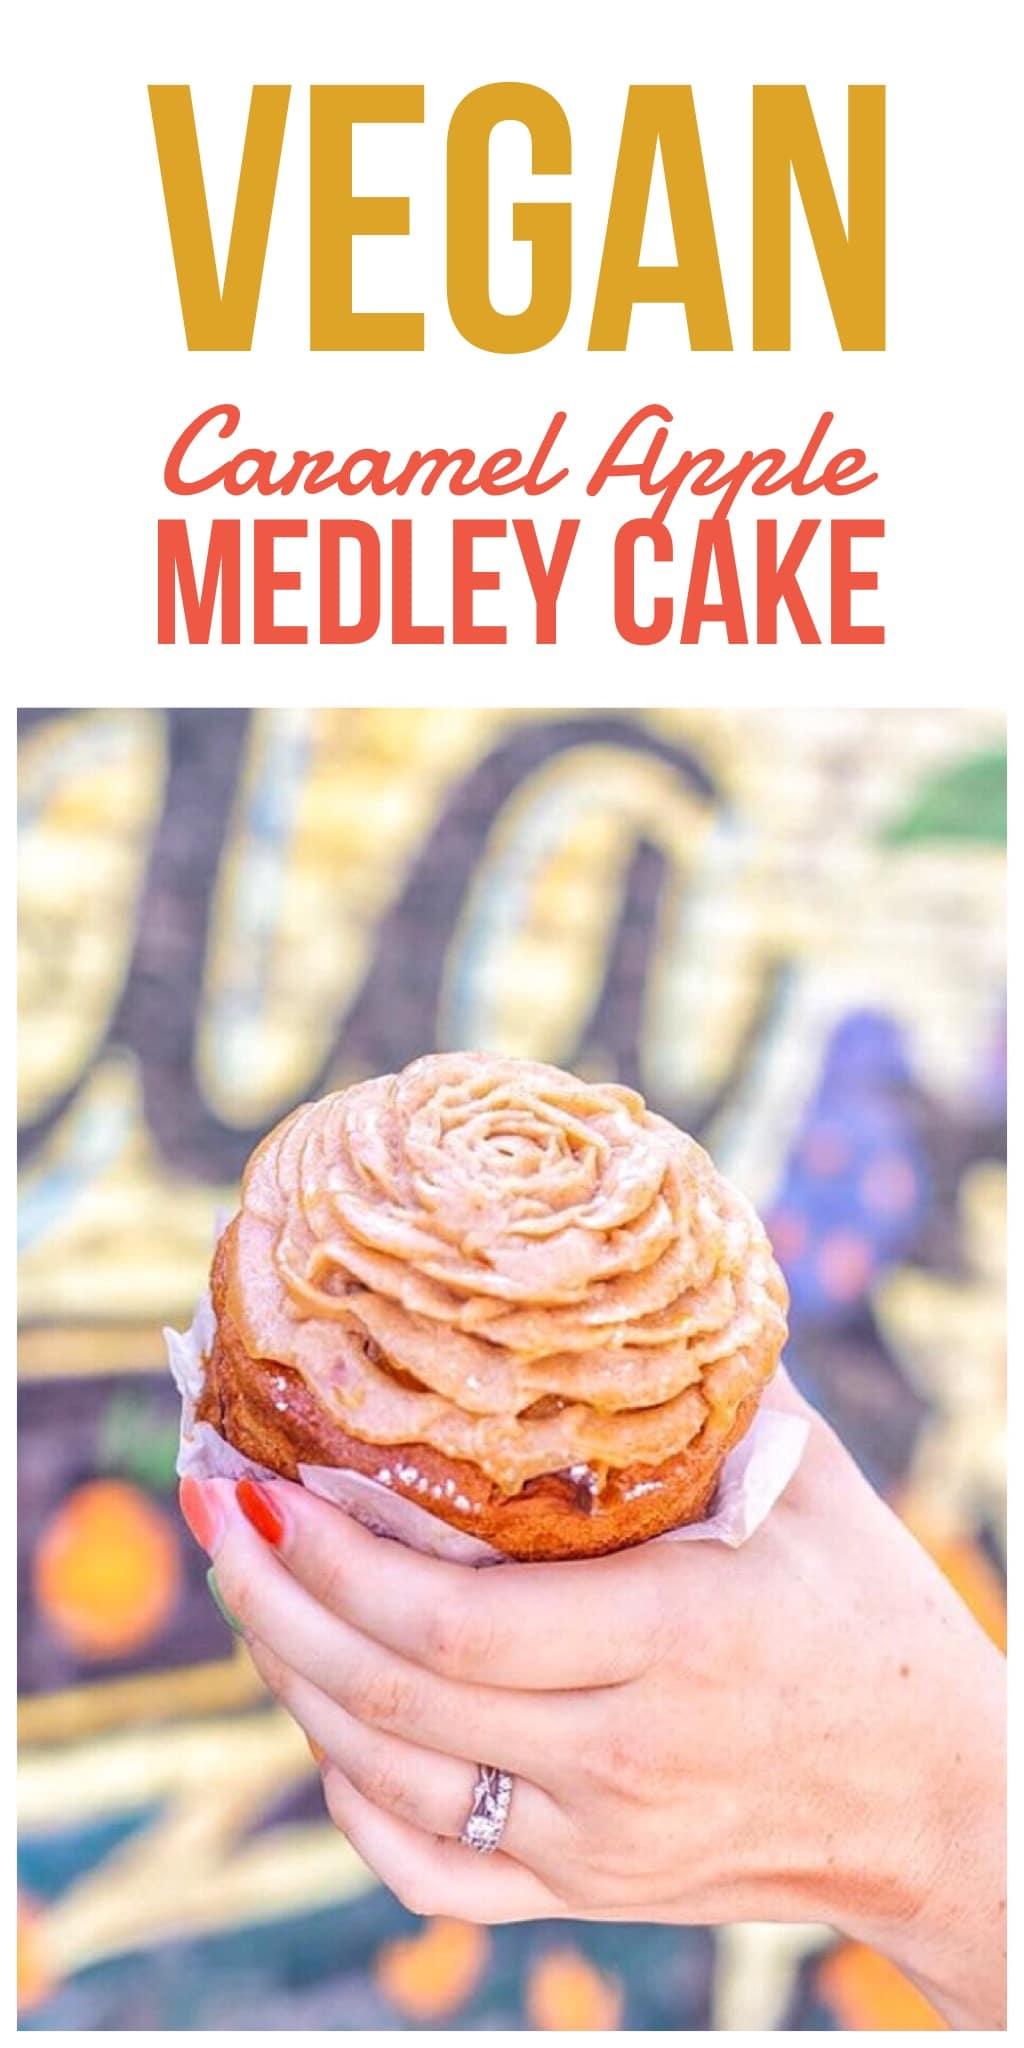 Vegan Caramel Apple Medley Cake for WonderFall Flavors in Disney Springs at Walt Disney World